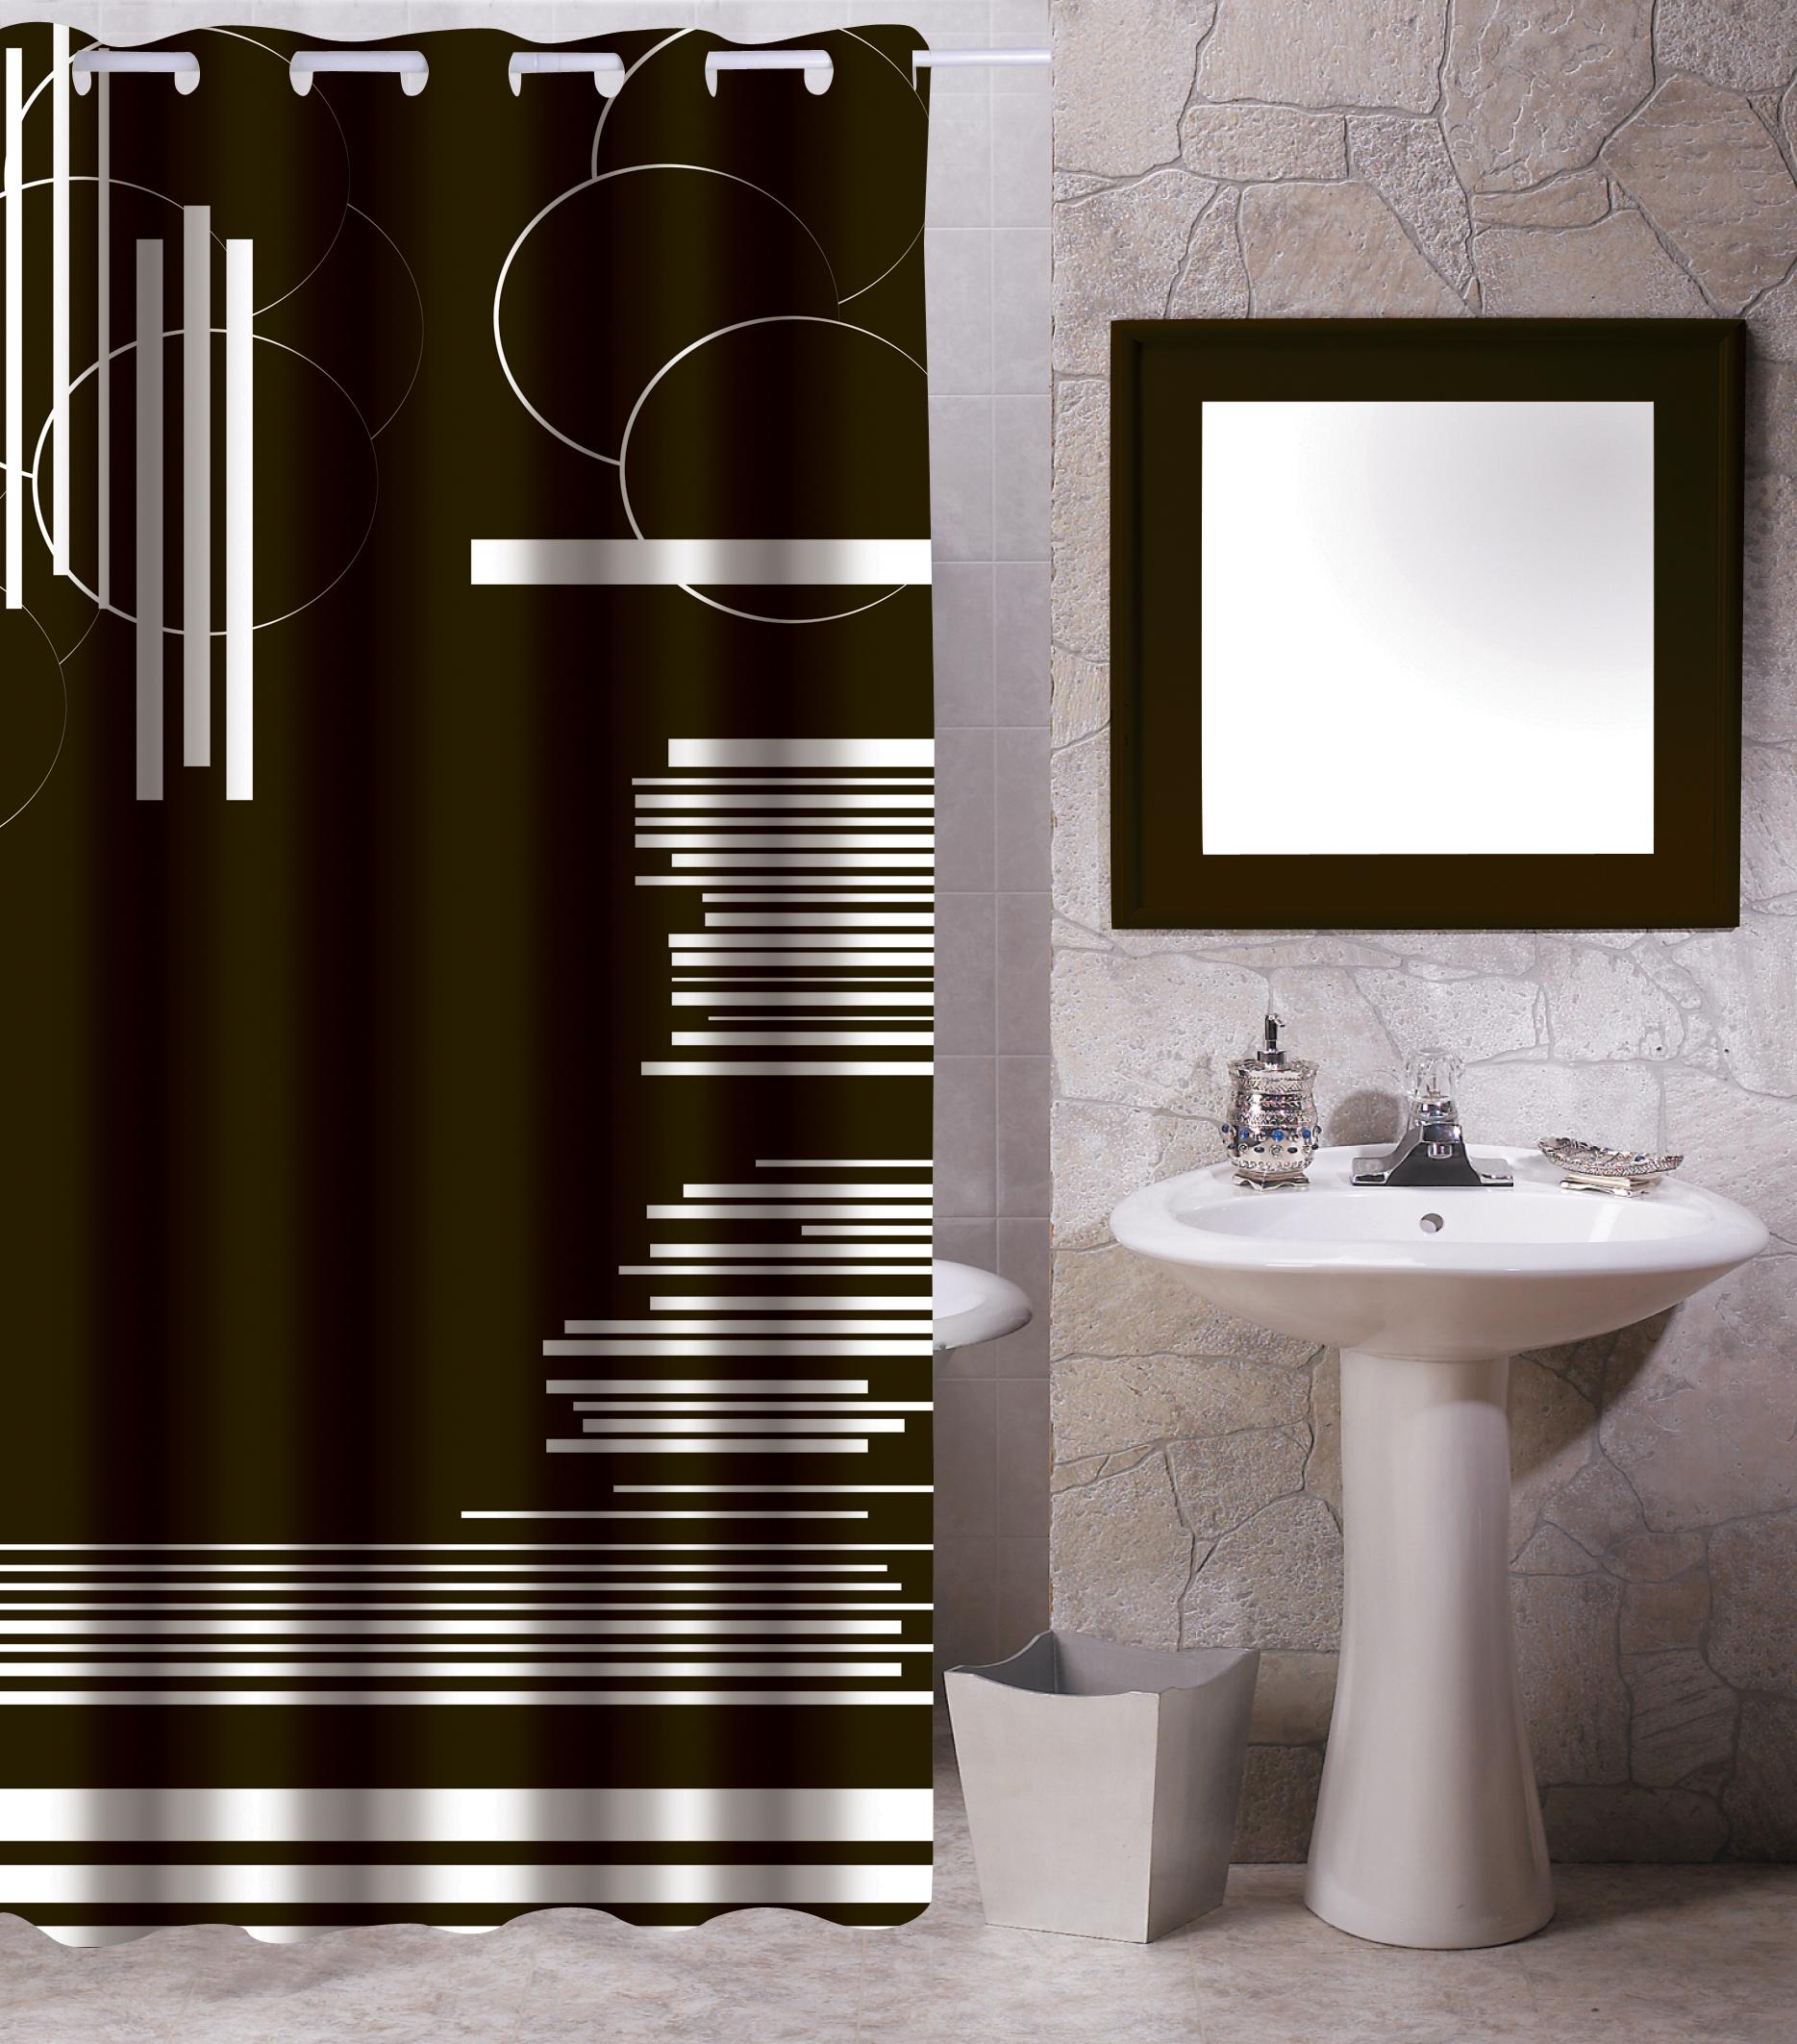 MSV Duschvorhang 180x200cm Anti Schimmel Textil Badewannenvorhang Wannenvorhang Grafik Schwarz